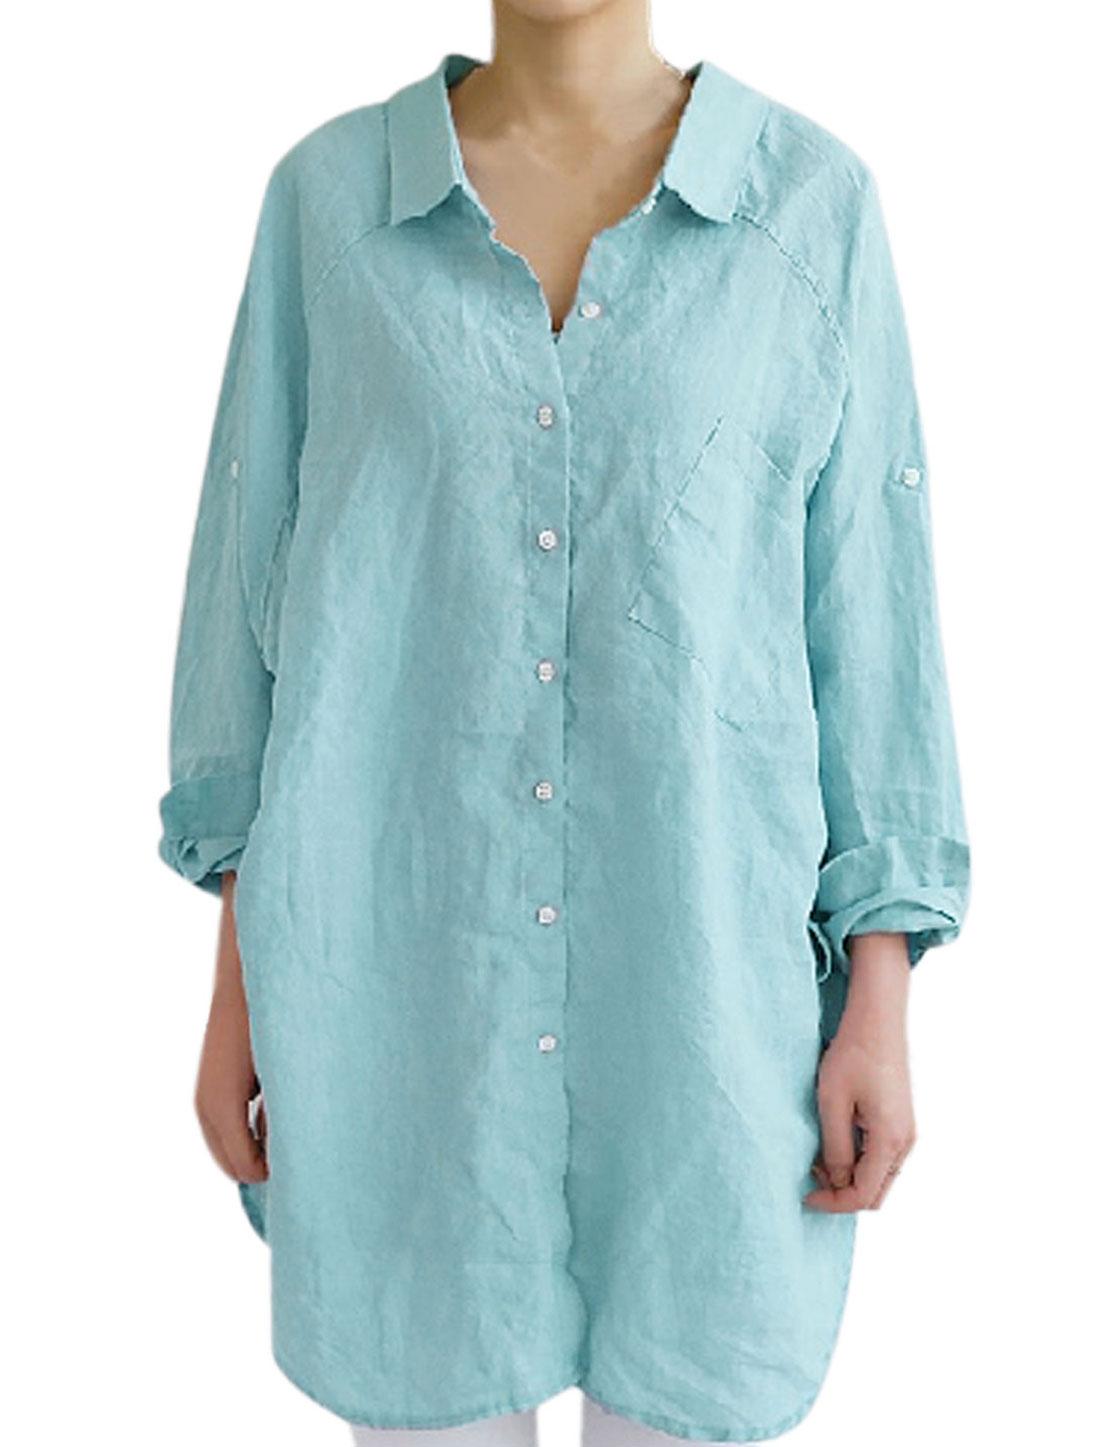 Lady's Slant Chest Pocket Button Closure Back Tunic Blouse Sky Blue S